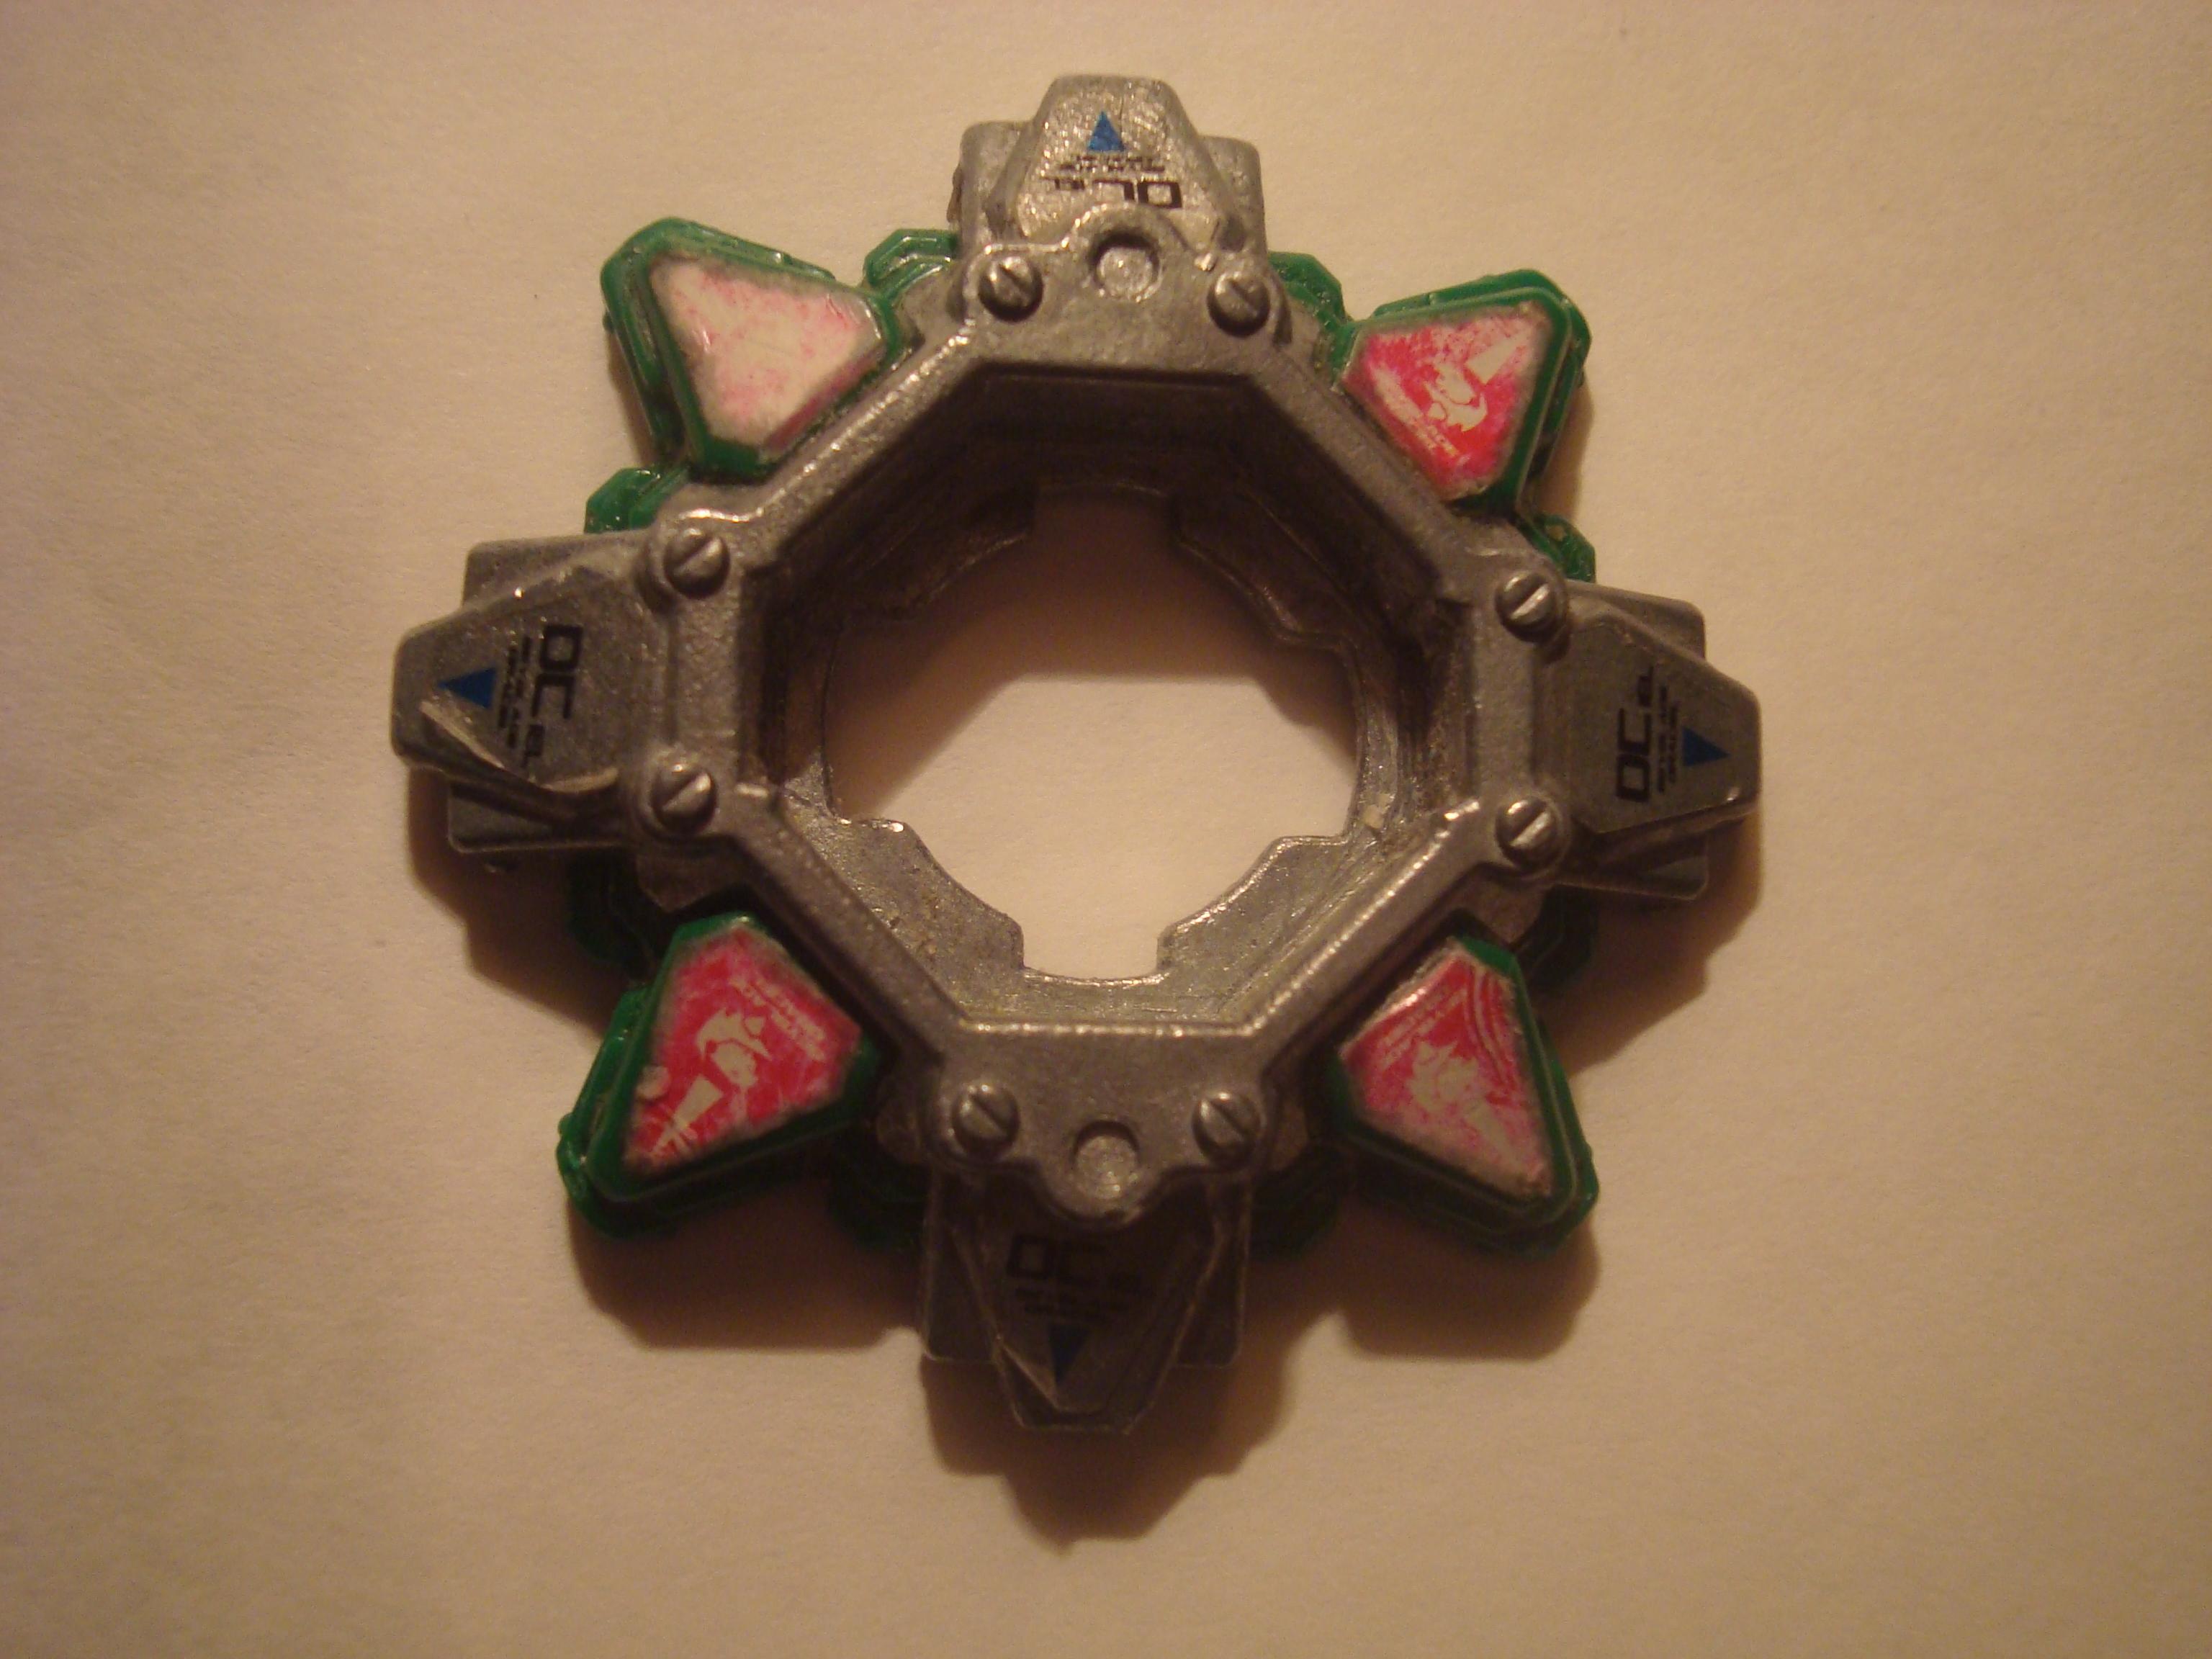 Attack Ring - Metal Defense